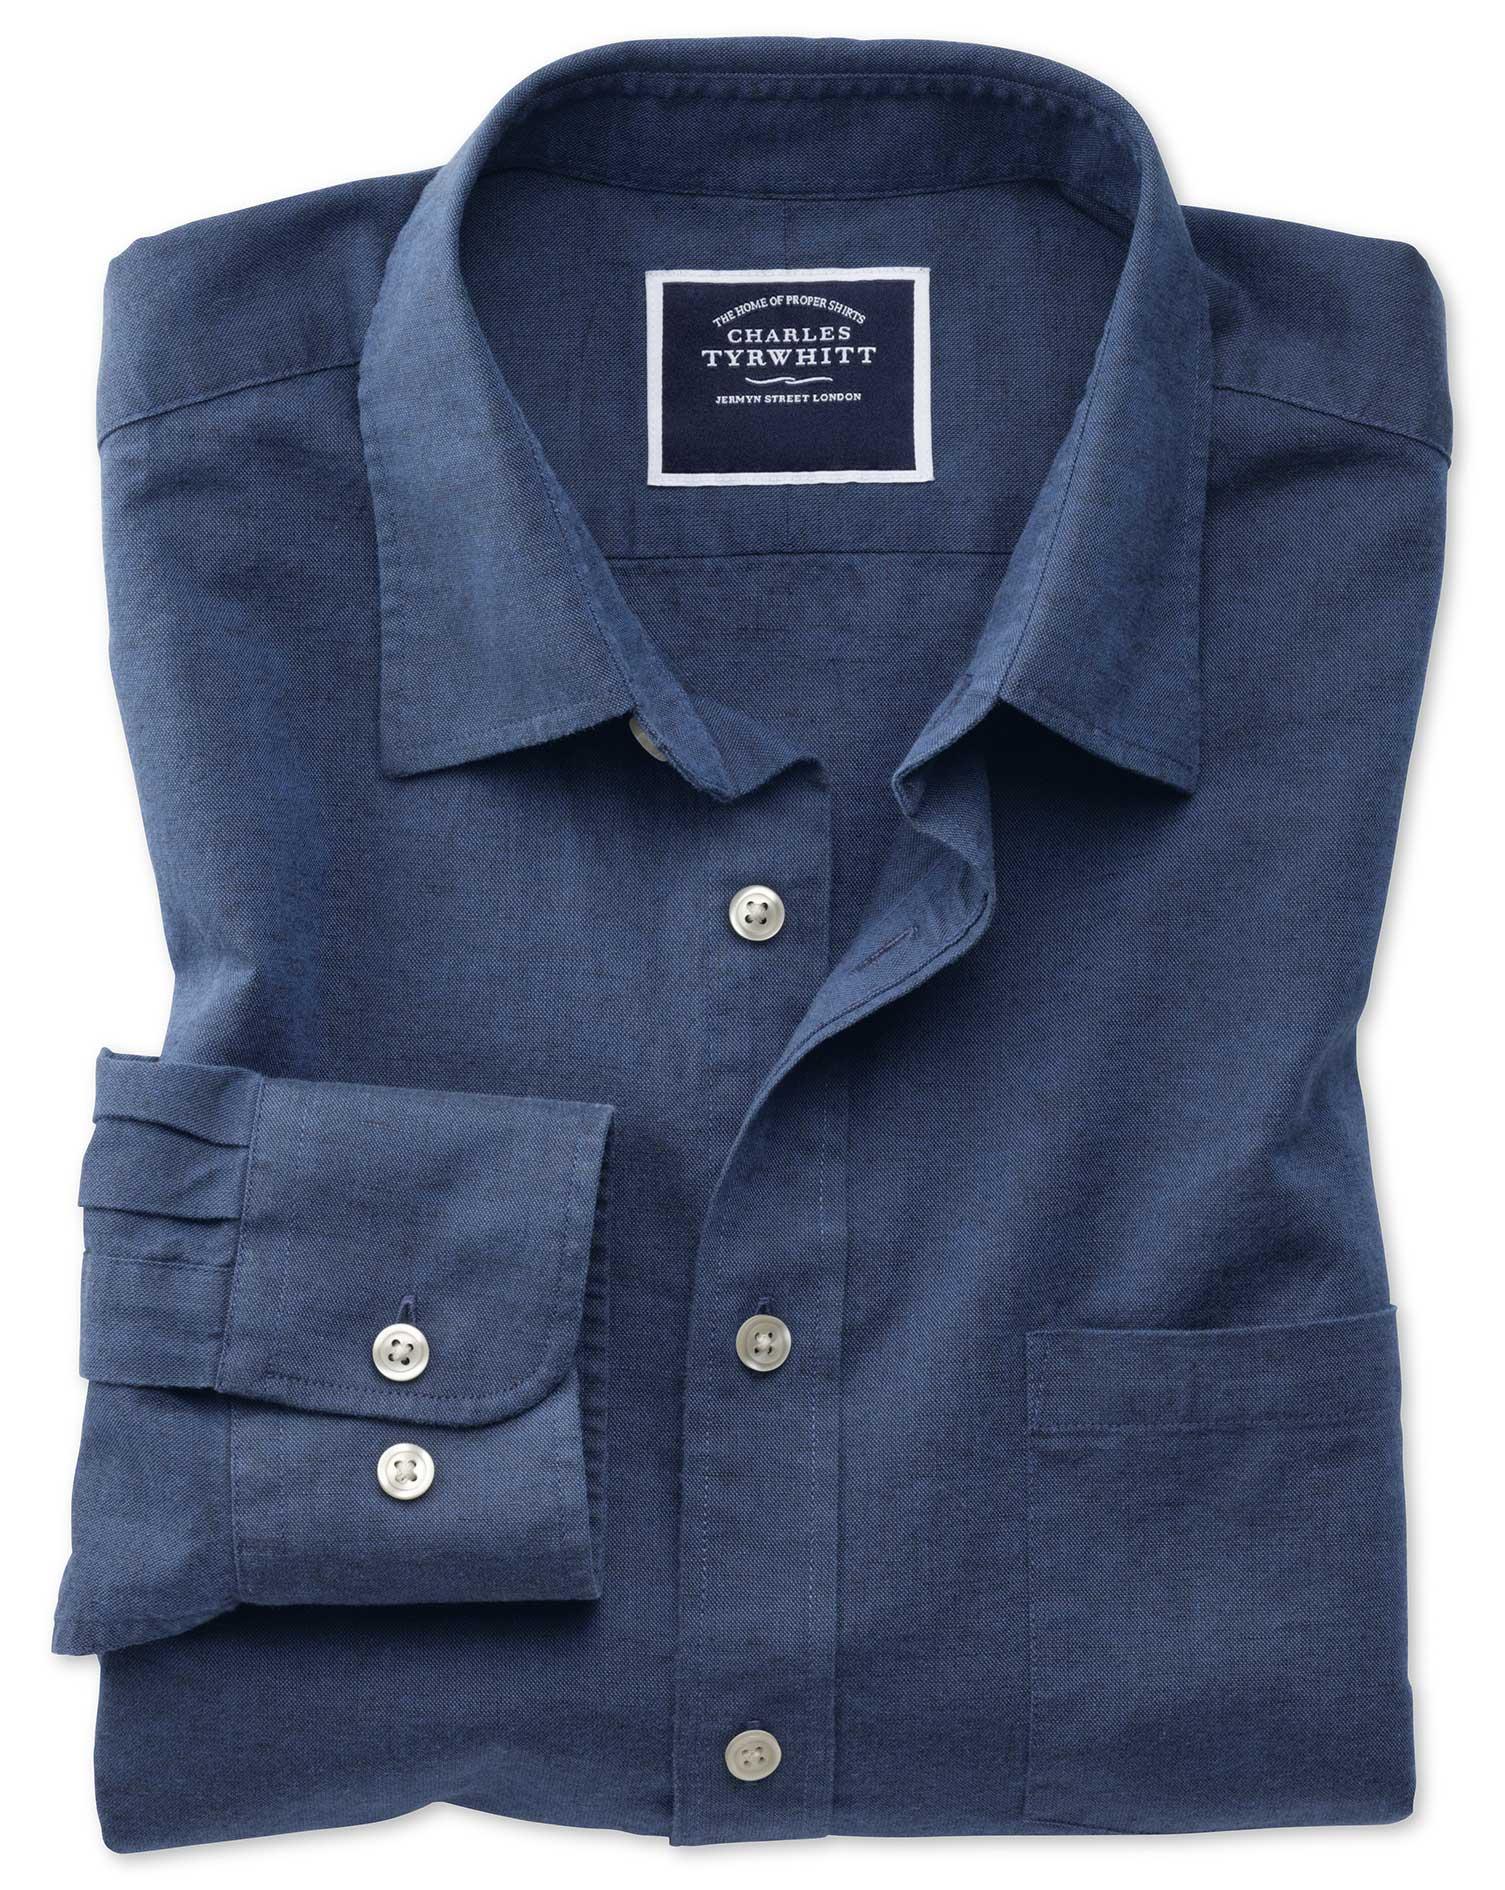 Classic Fit Cotton Linen Navy Plain Shirt Single Cuff Size Small by Charles Tyrwhitt